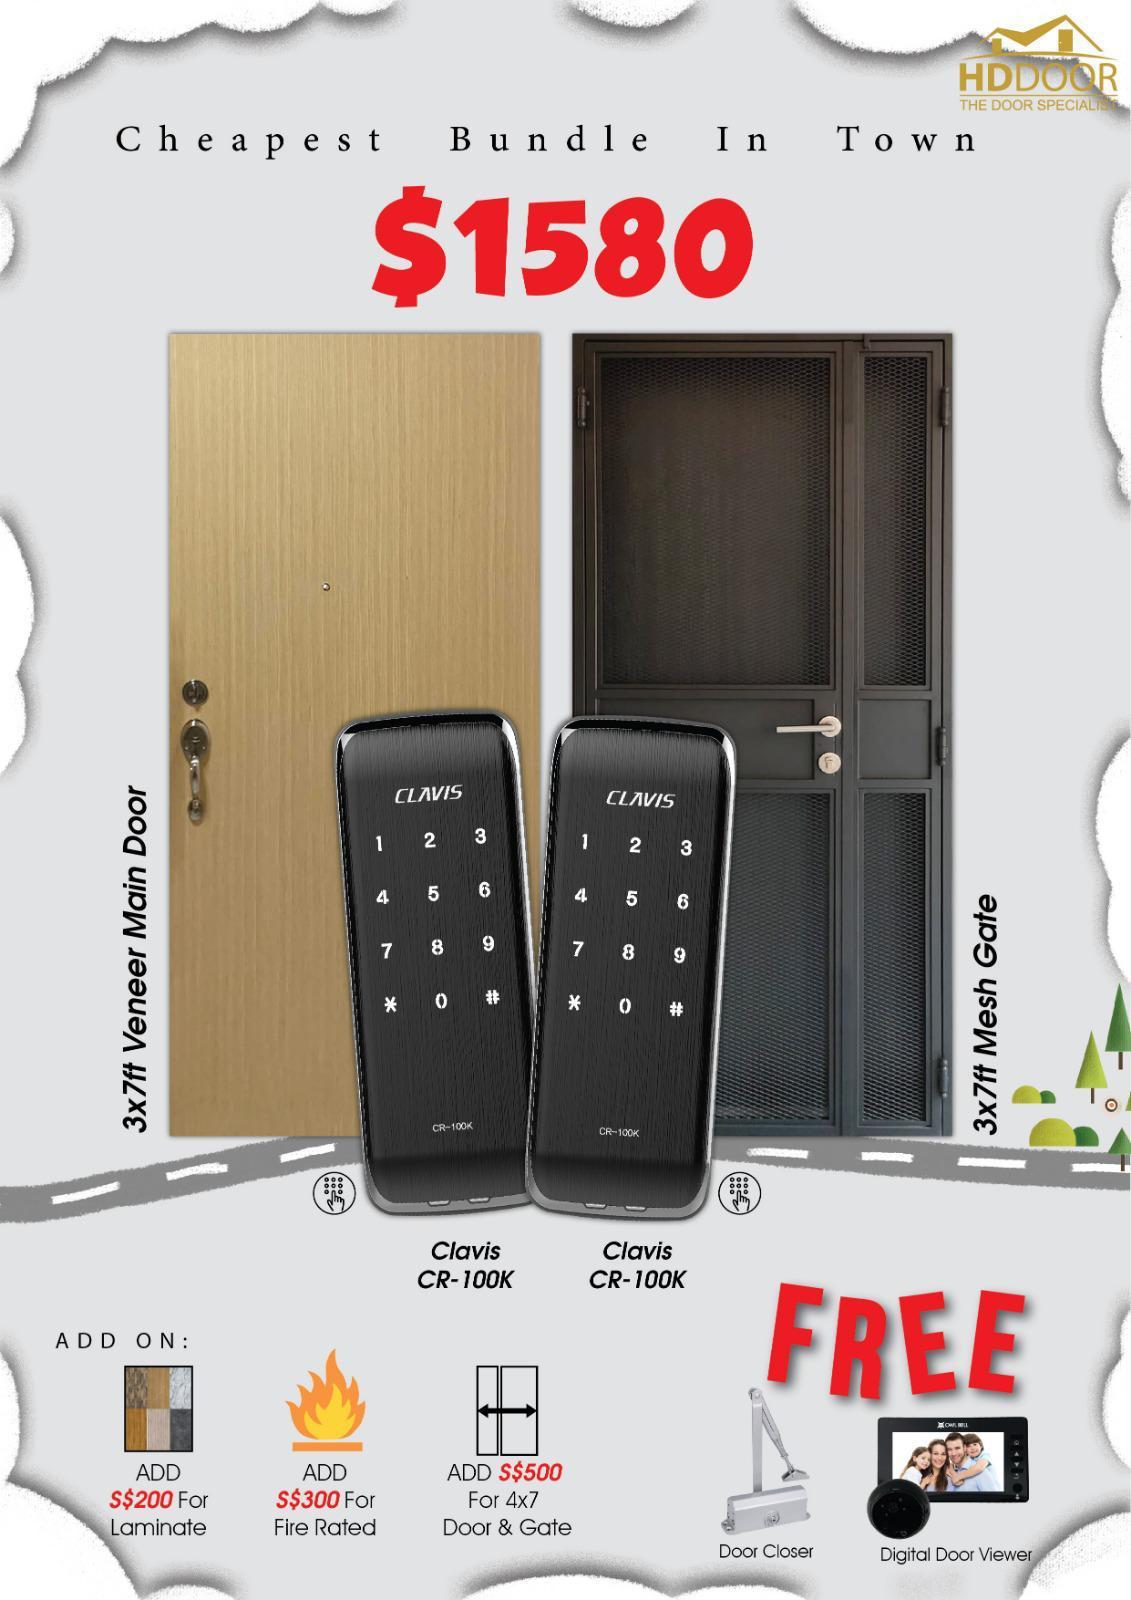 Cheapest Bundle Promotion 2020 | Why Not Deals 3 & Promotions